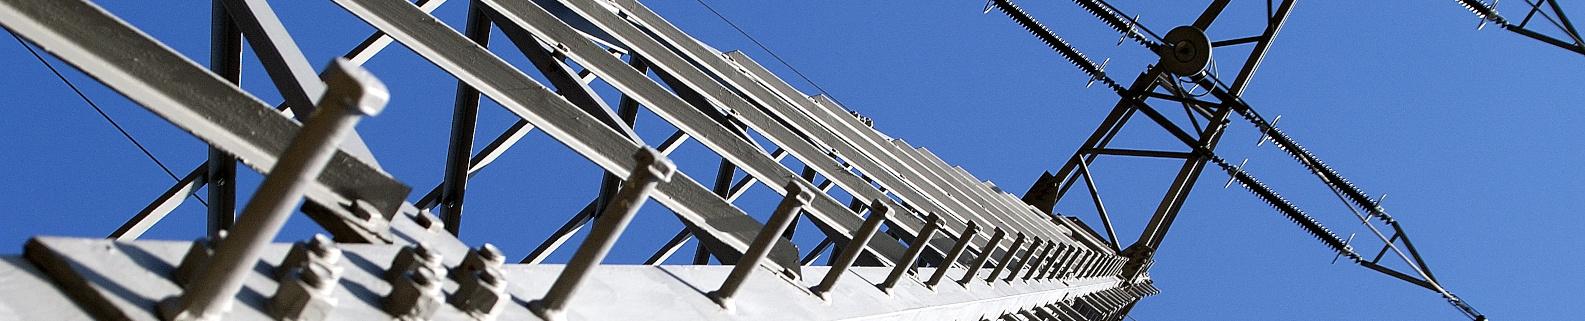 copyright_Bumann-stock.adobe.com